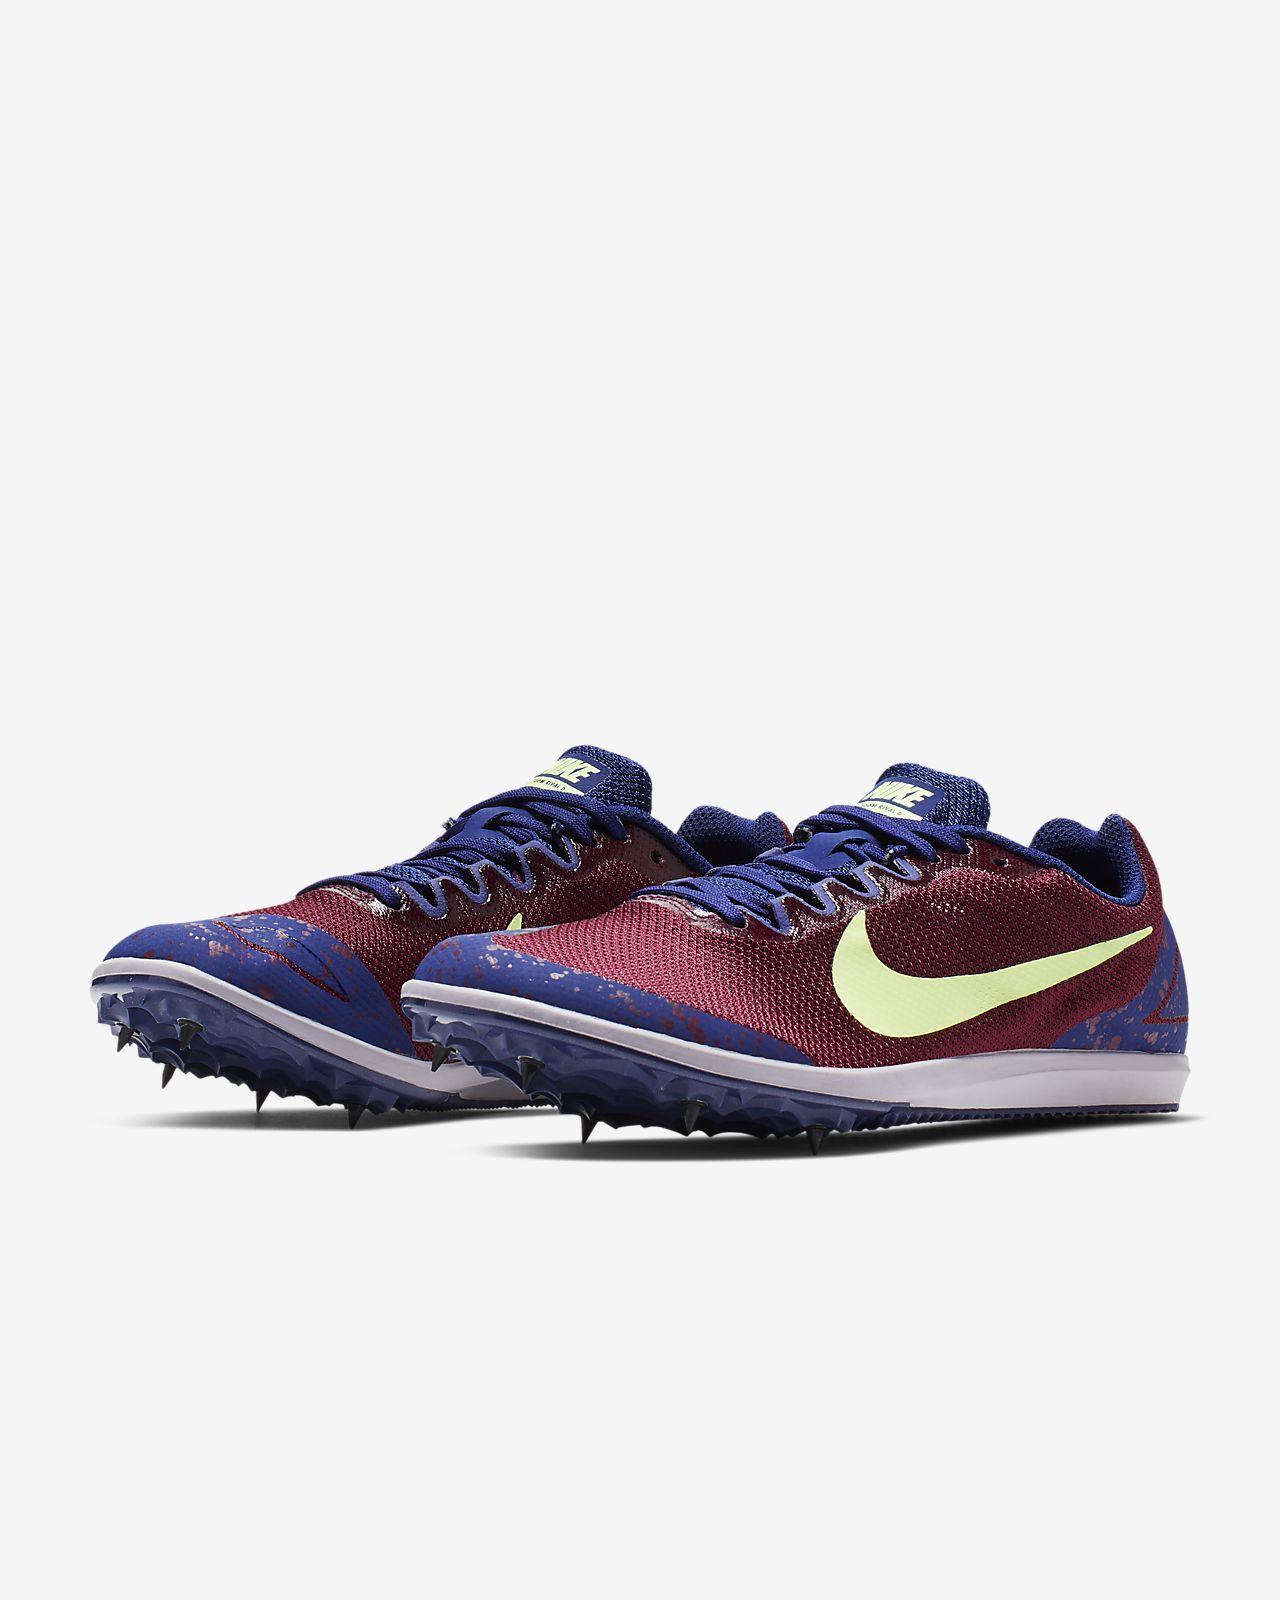 Nike Zoom Rival D 10 Track Spike Spikes für Damen Blau